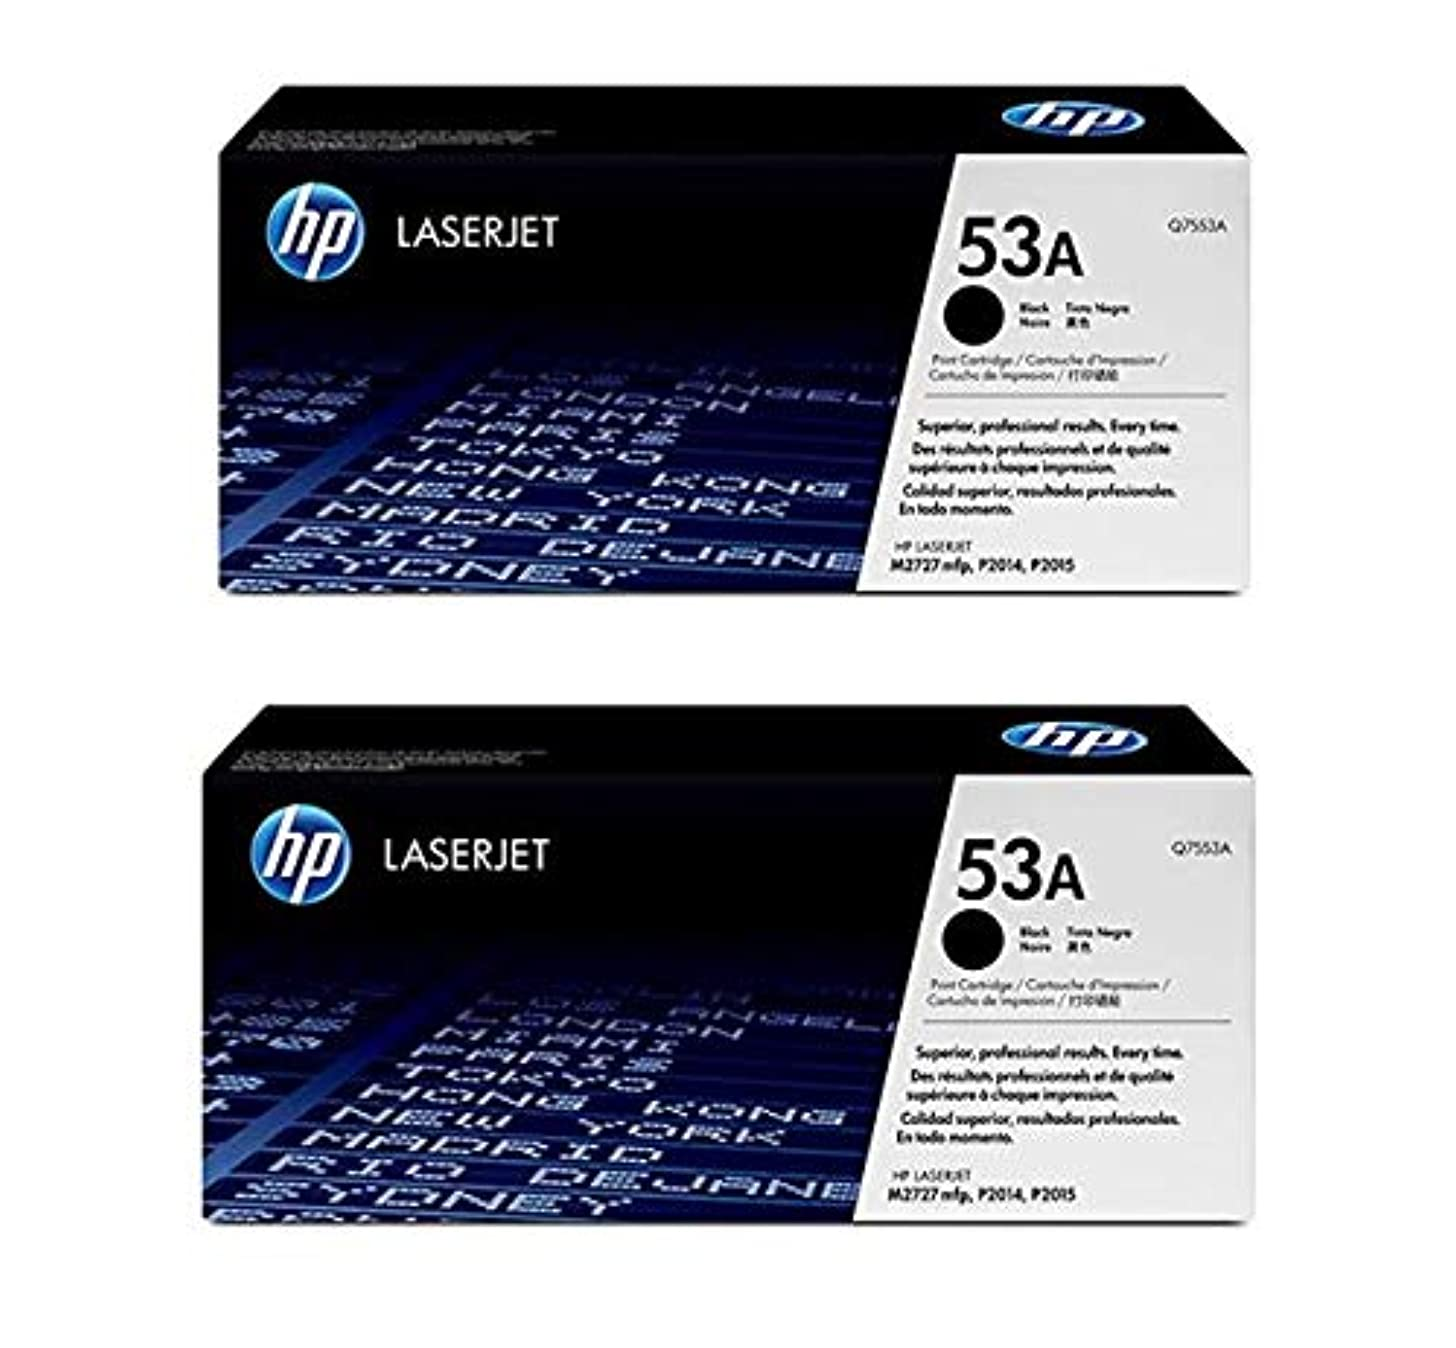 HEW Q7553A 53A Black Print Cartridge M2727 P2014 P2015 2-Packs